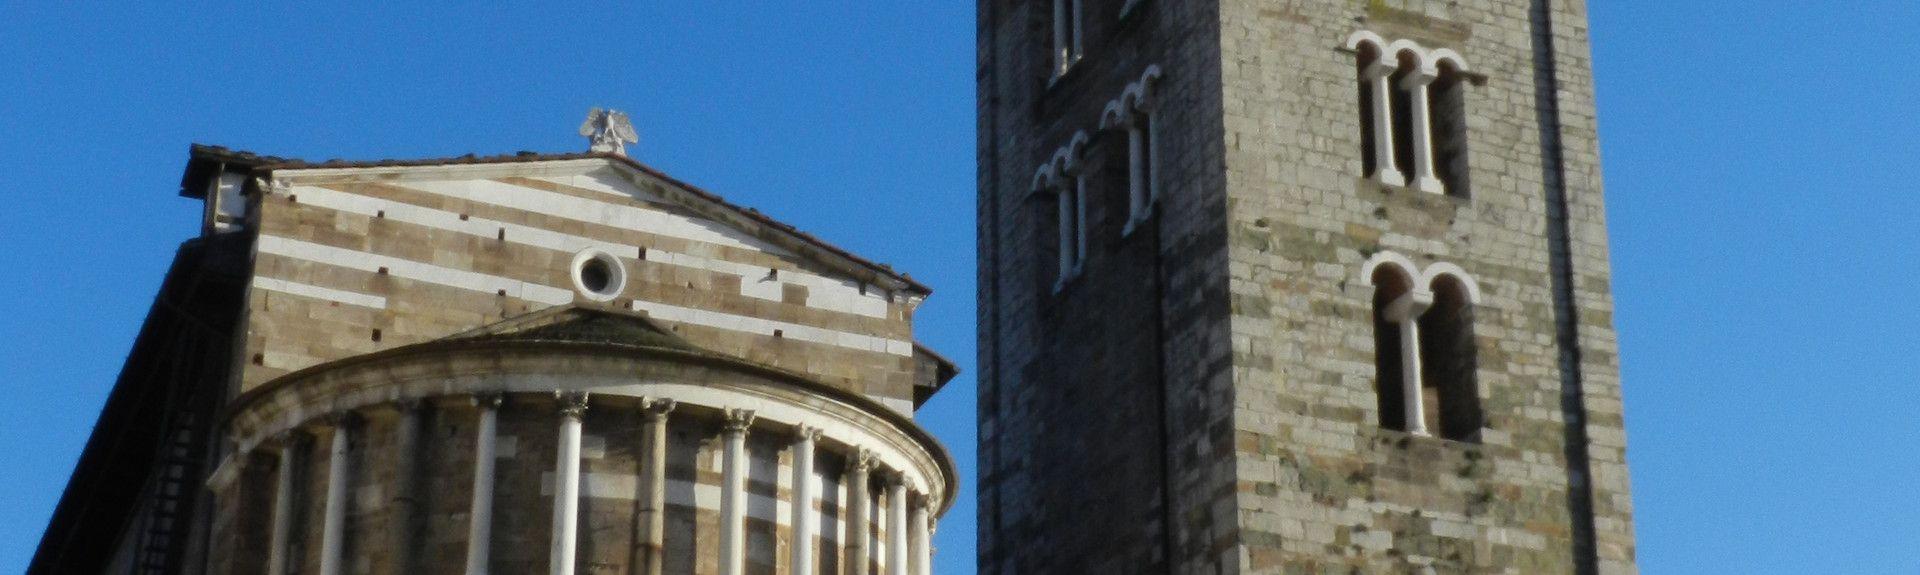 Scuola Normale Superiore (Hochschule), Pisa, Toskana, Italien